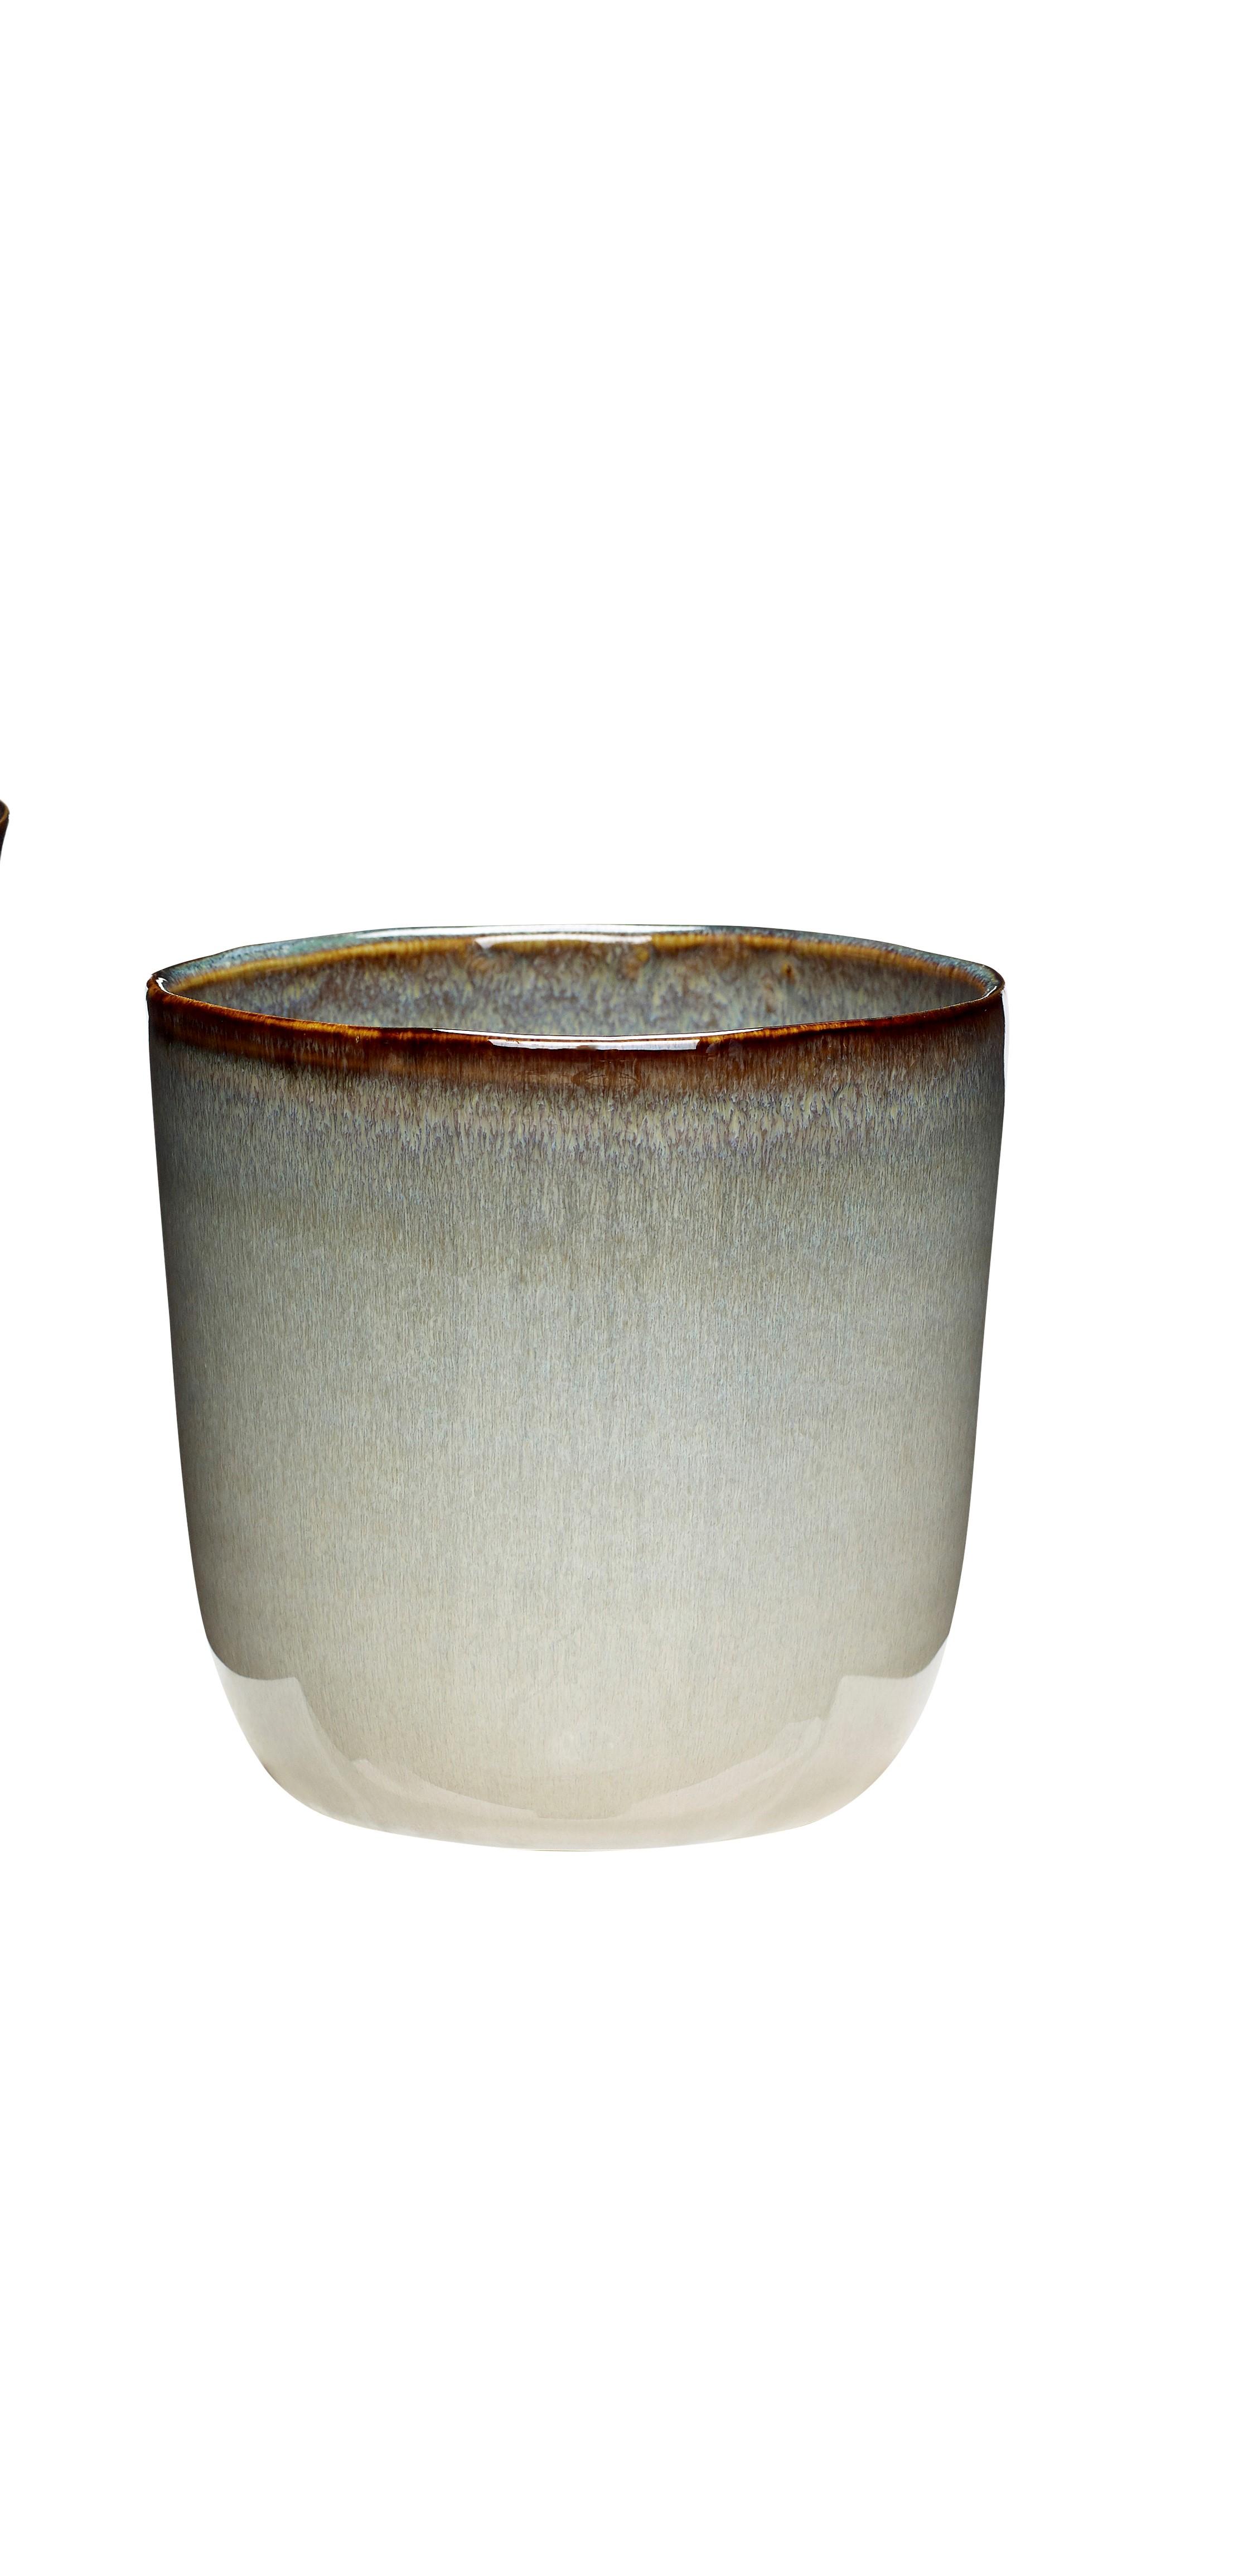 Plant pot Ceramic Beige & white